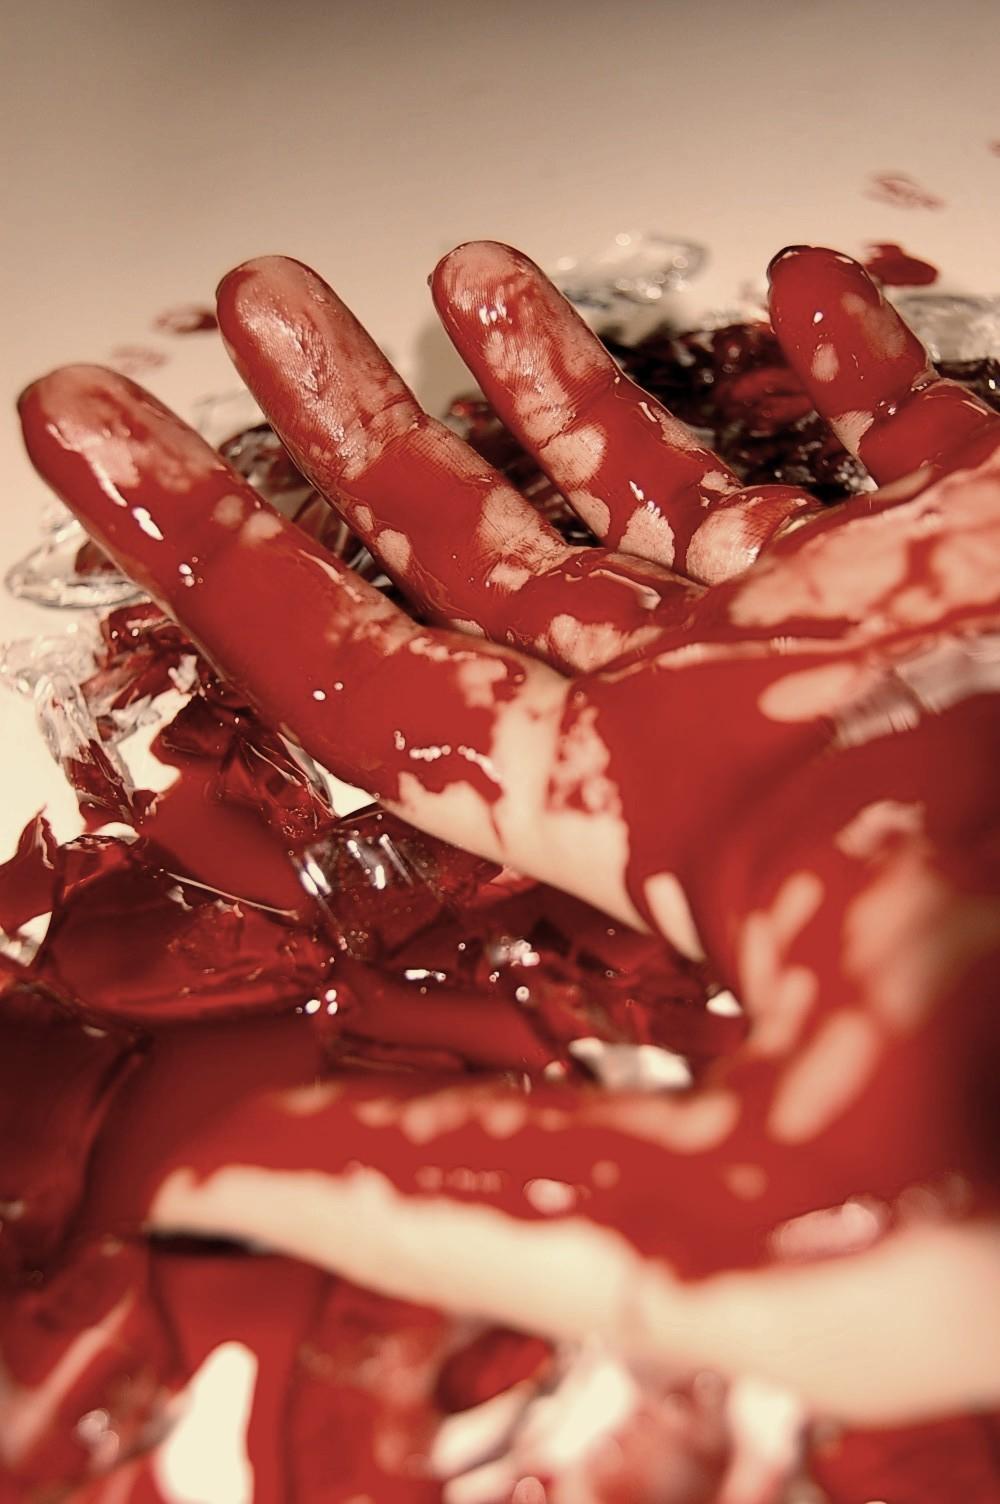 dead-hand-1148379